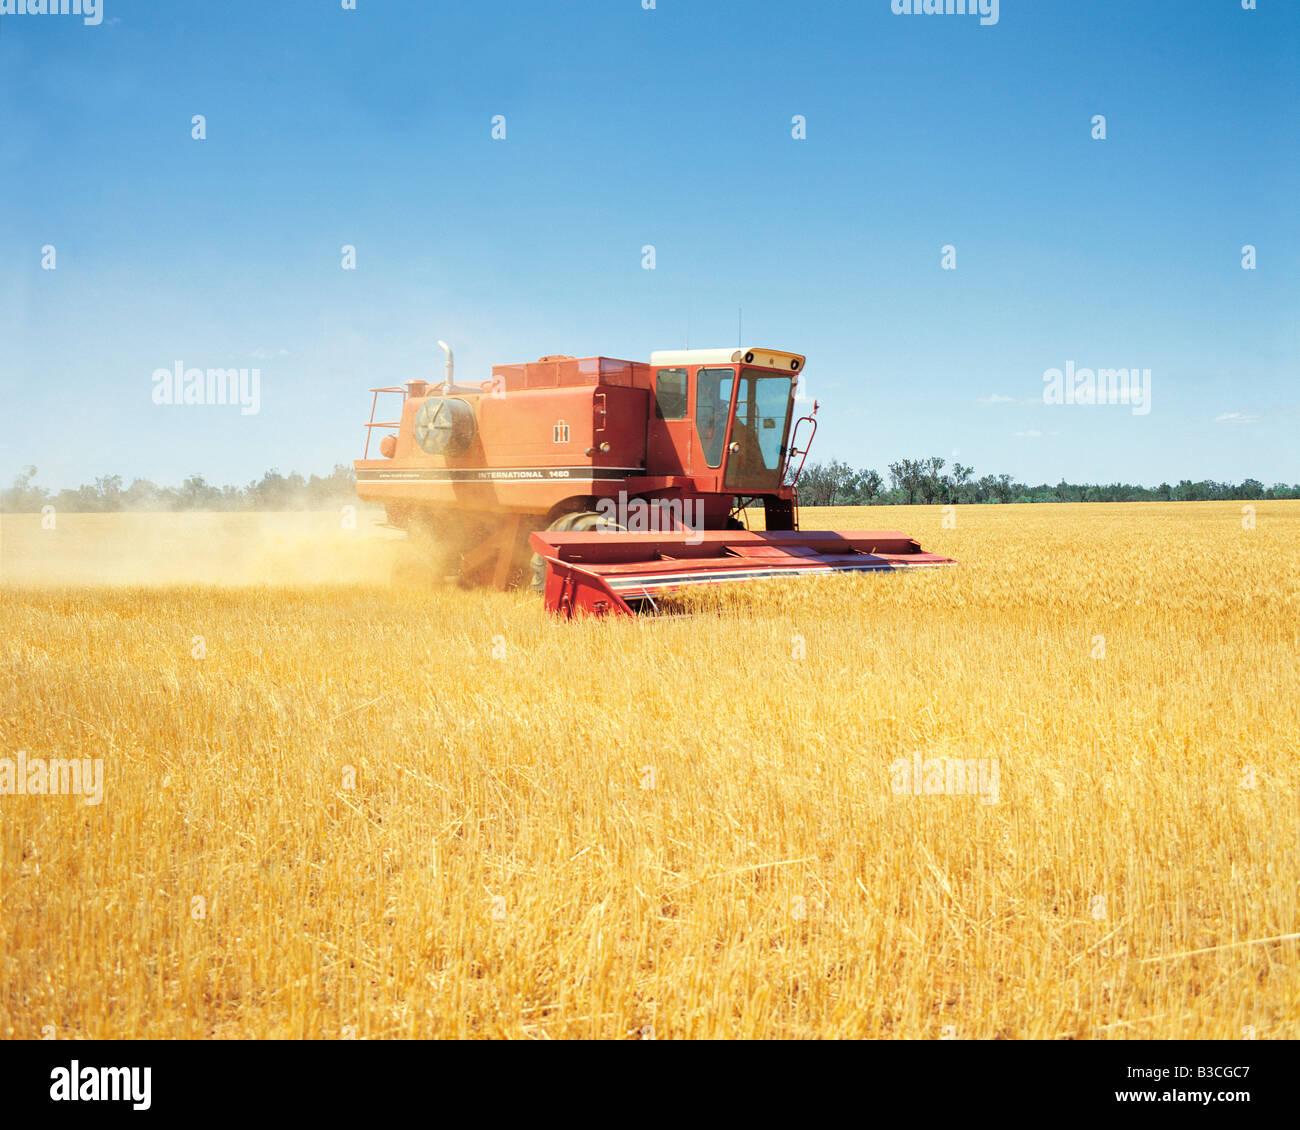 Combine harvester harvesting wheat crop in field. Australia. - Stock Image